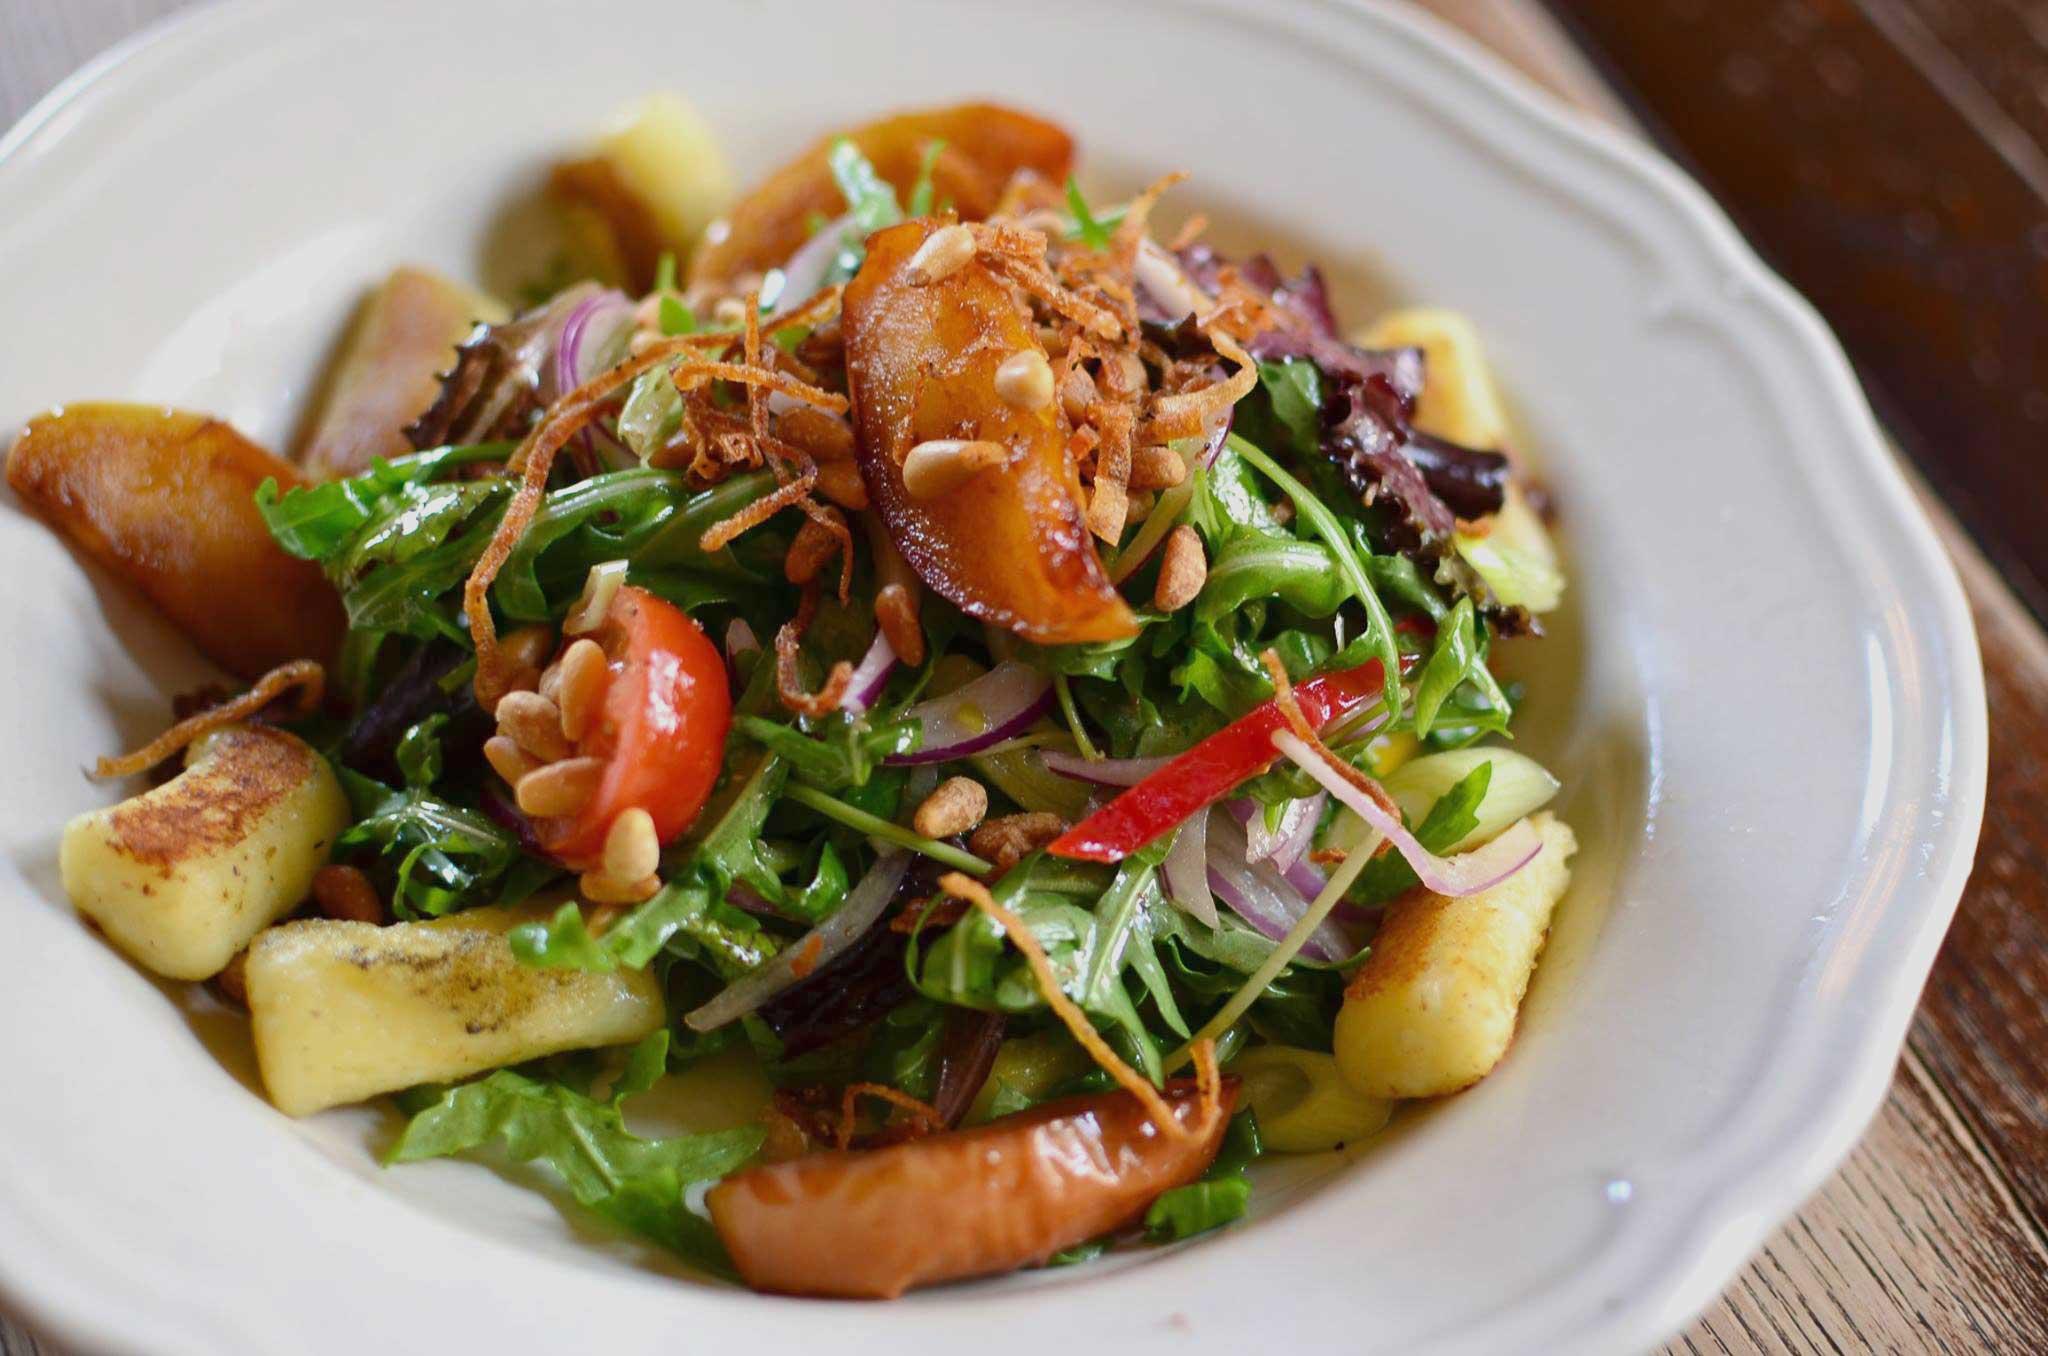 Gnosh the Gnoochi and Apple Salad - recipe